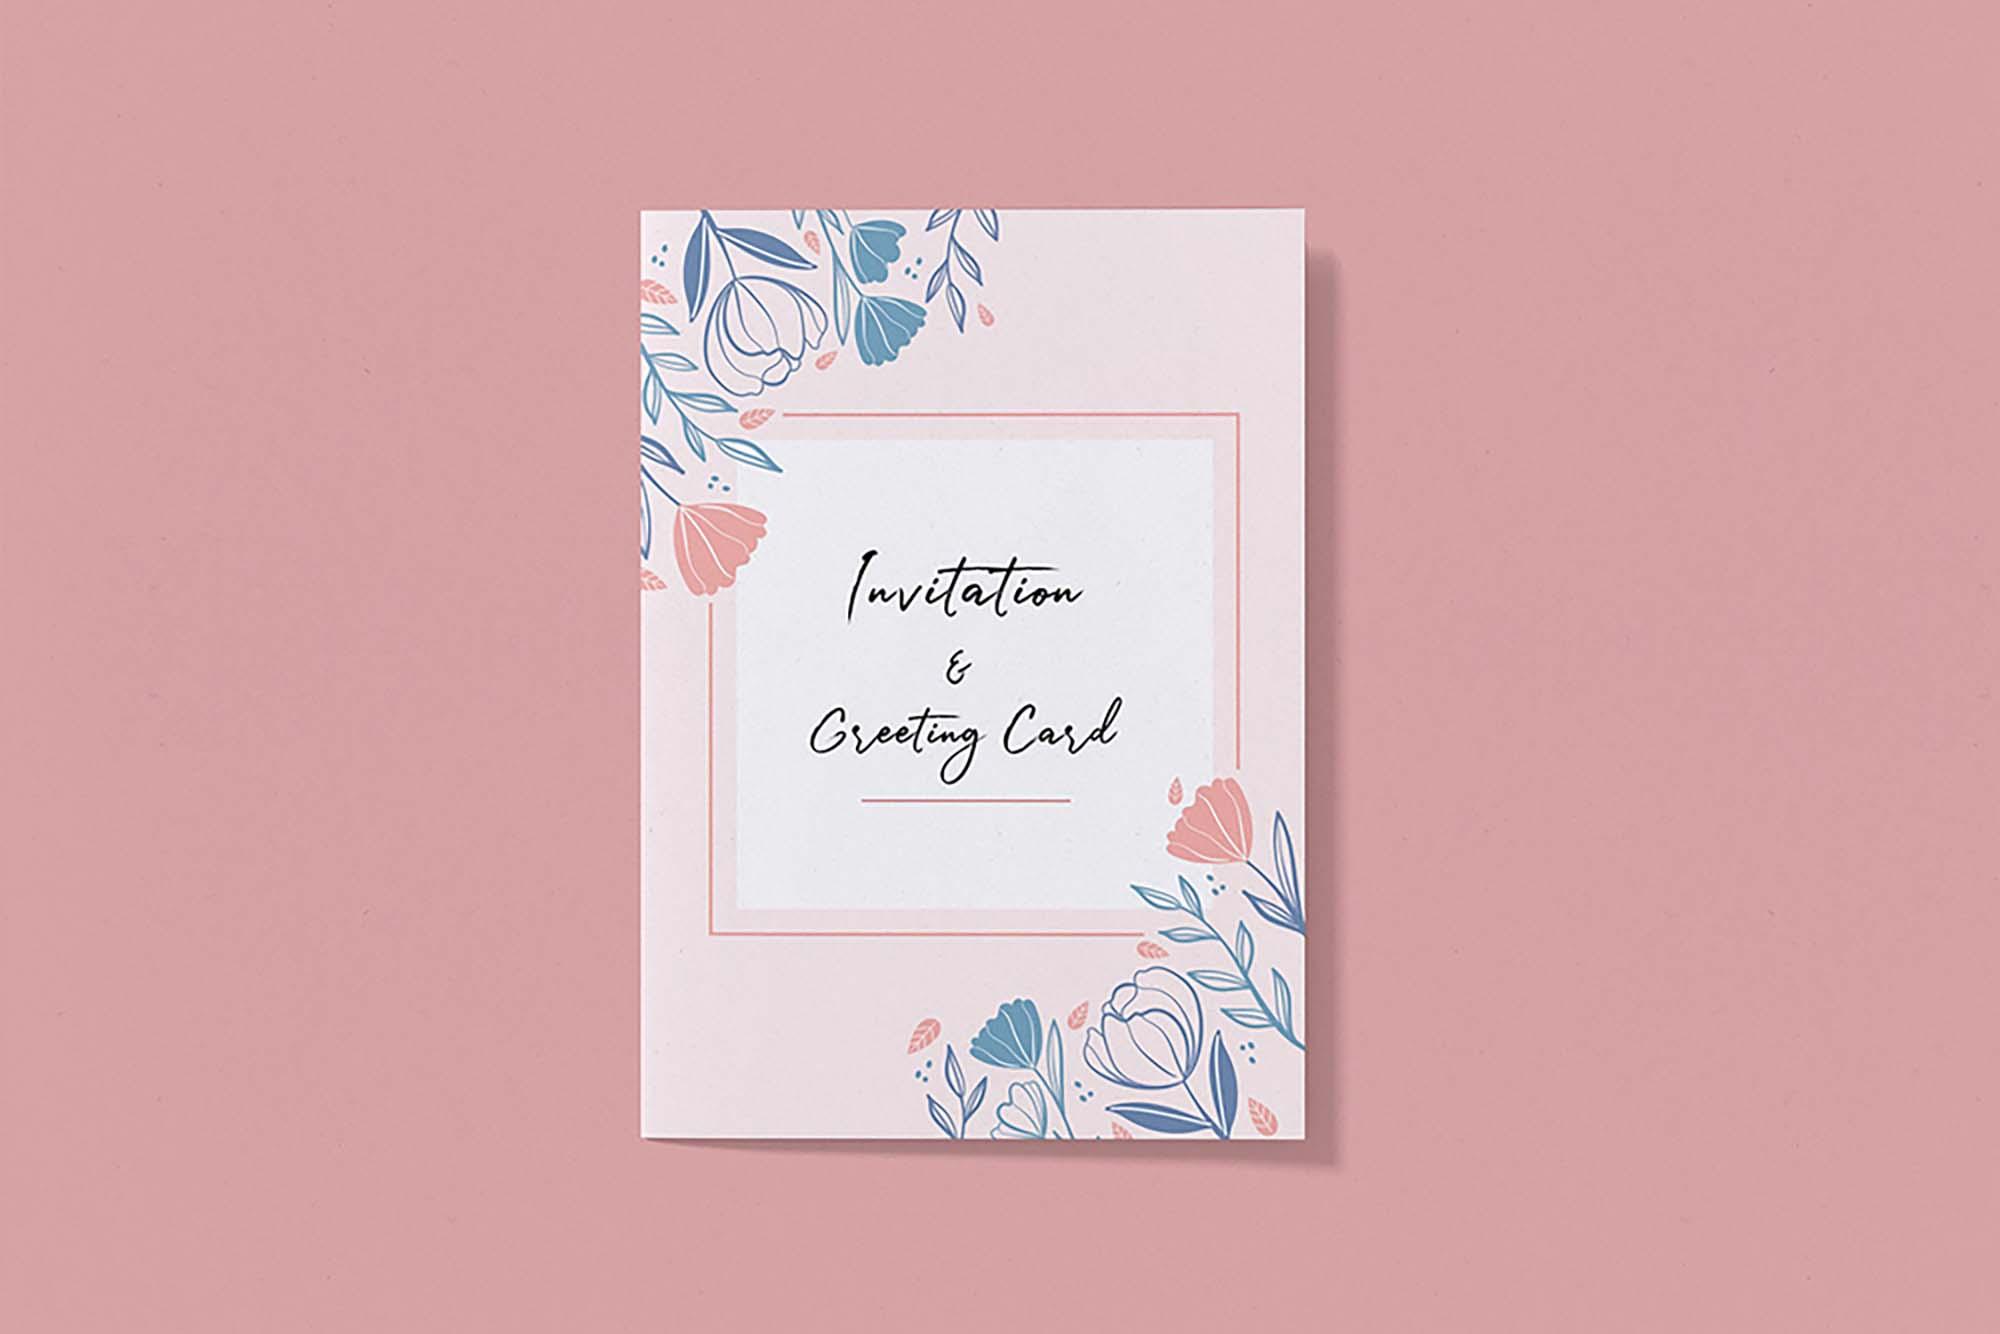 Free Invitation & Greeting Card Mockup (PSD)